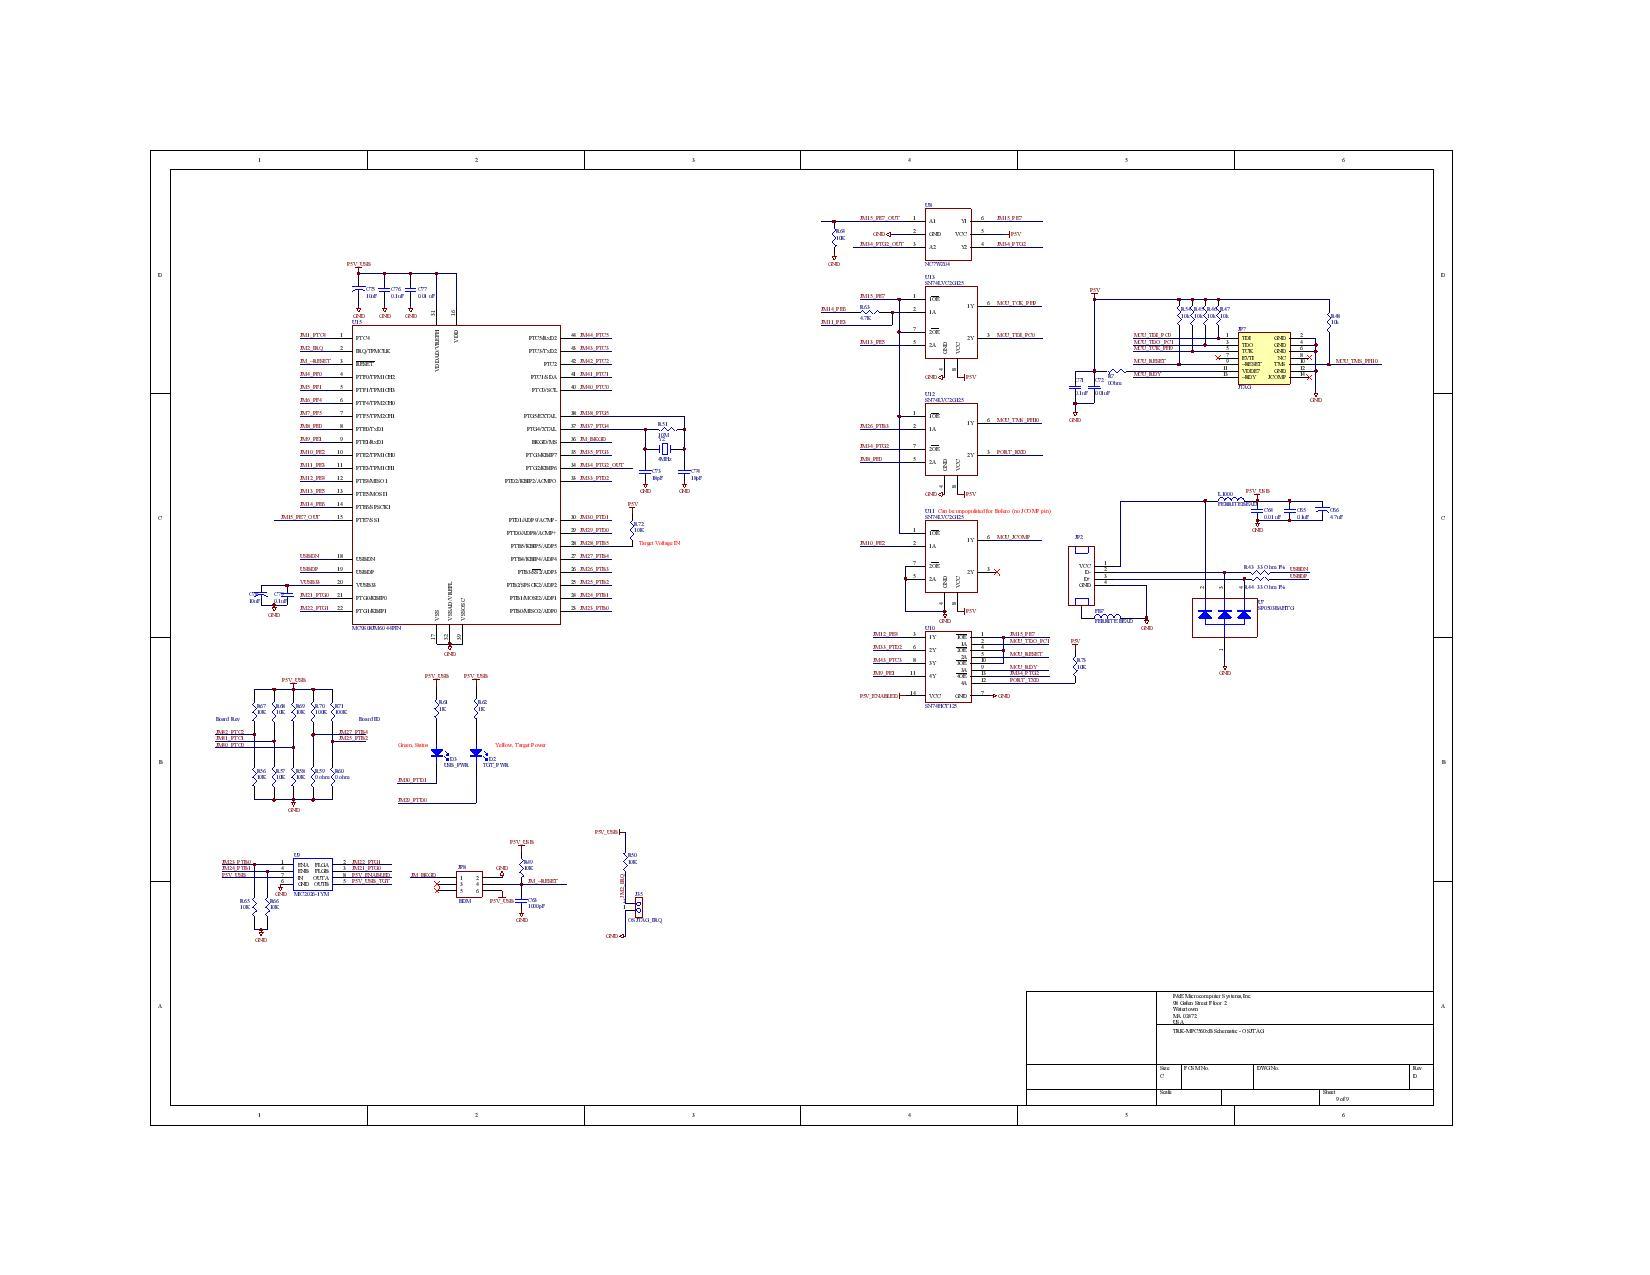 fire relay module wiring diagram